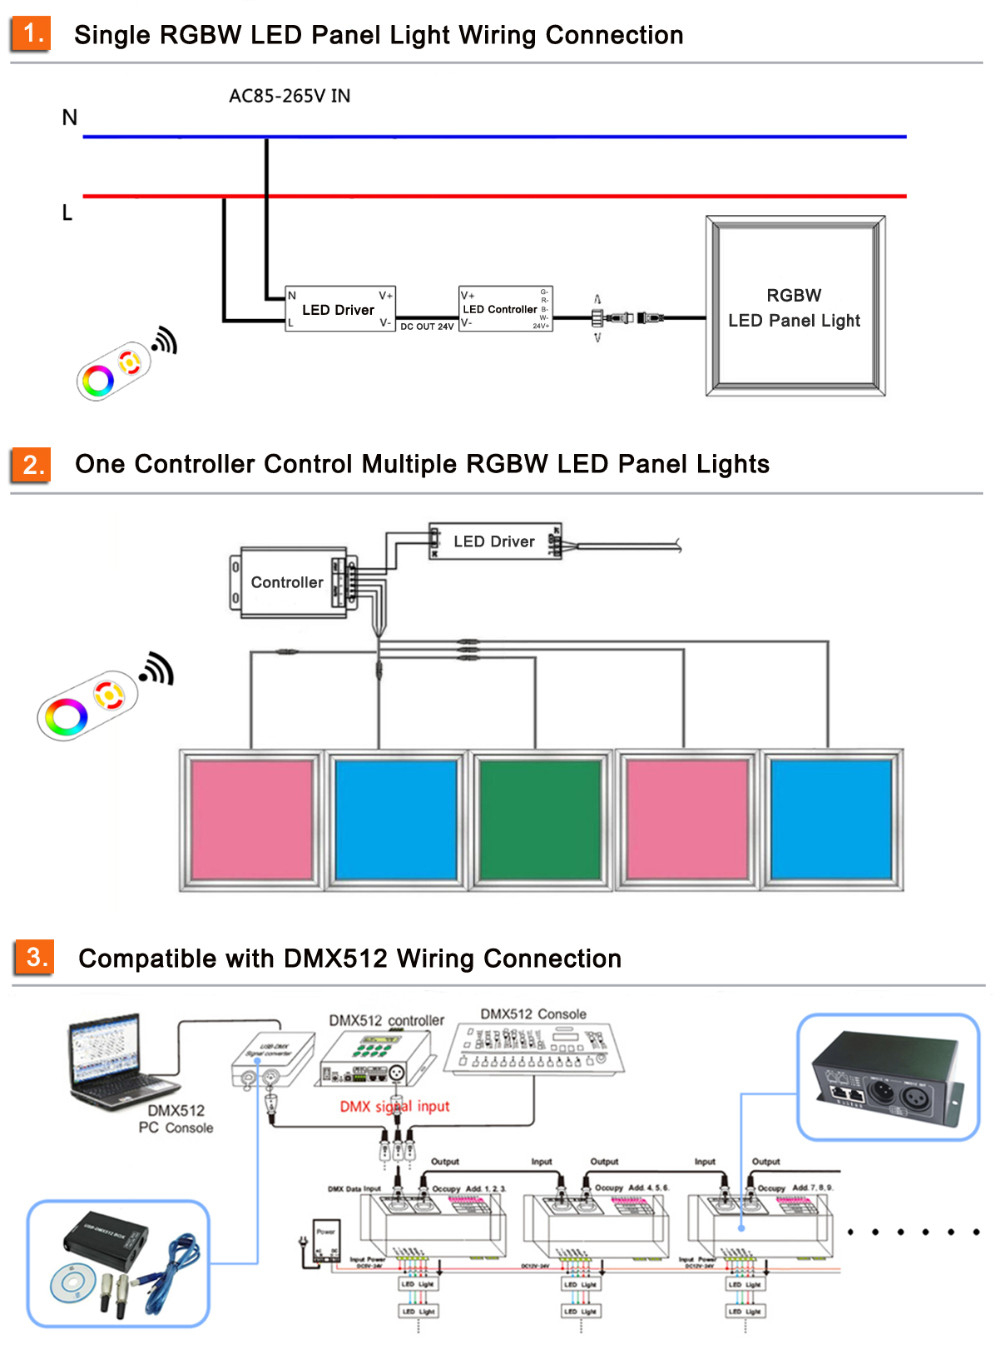 Led Panel Wiring Diagram | Schematic Diagram - Ceiling Light Wiring Diagram